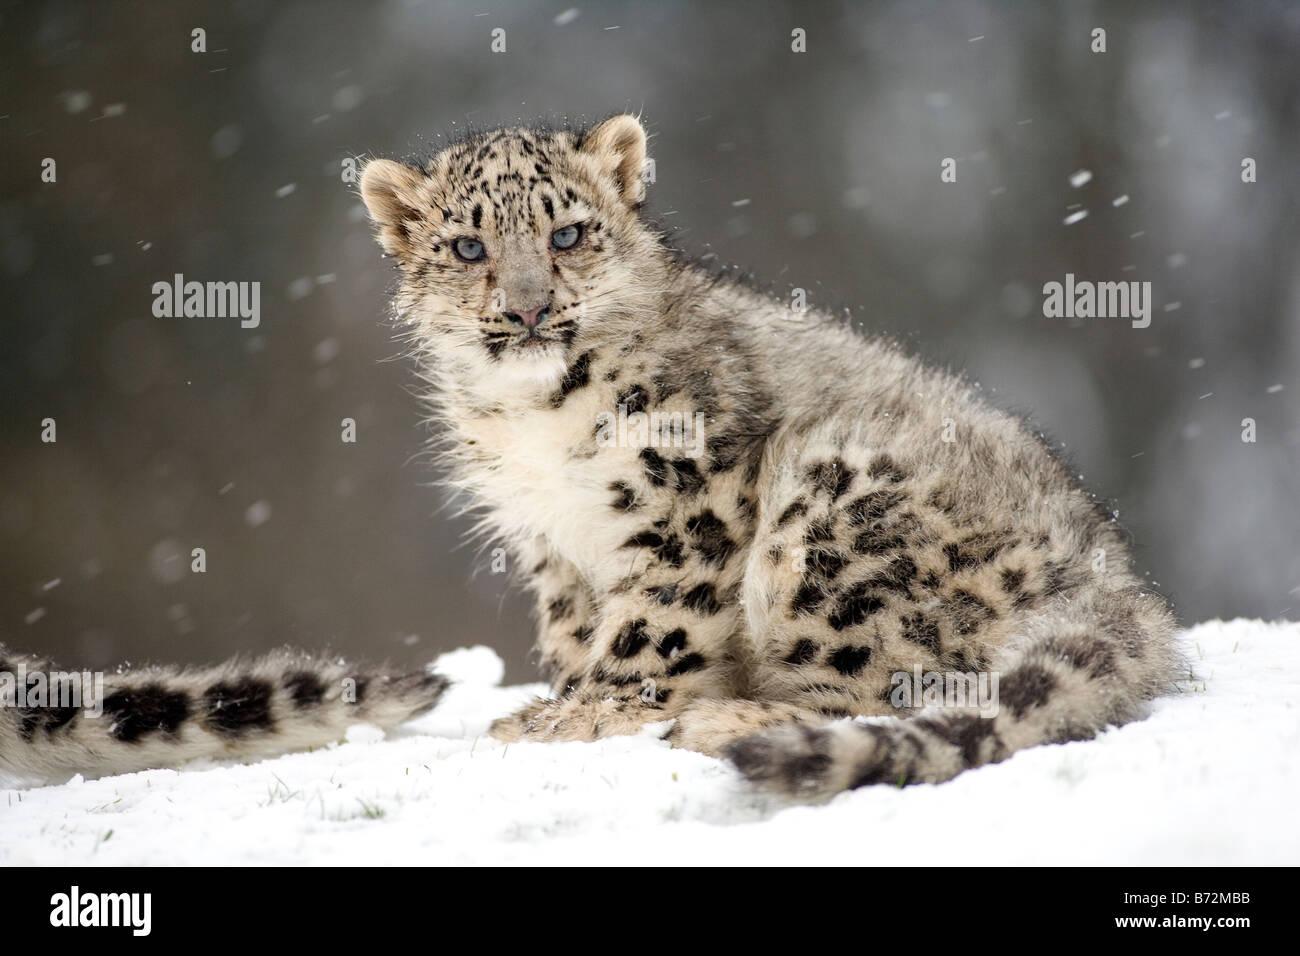 Snow Leopard Cub en la nieve. Imagen De Stock